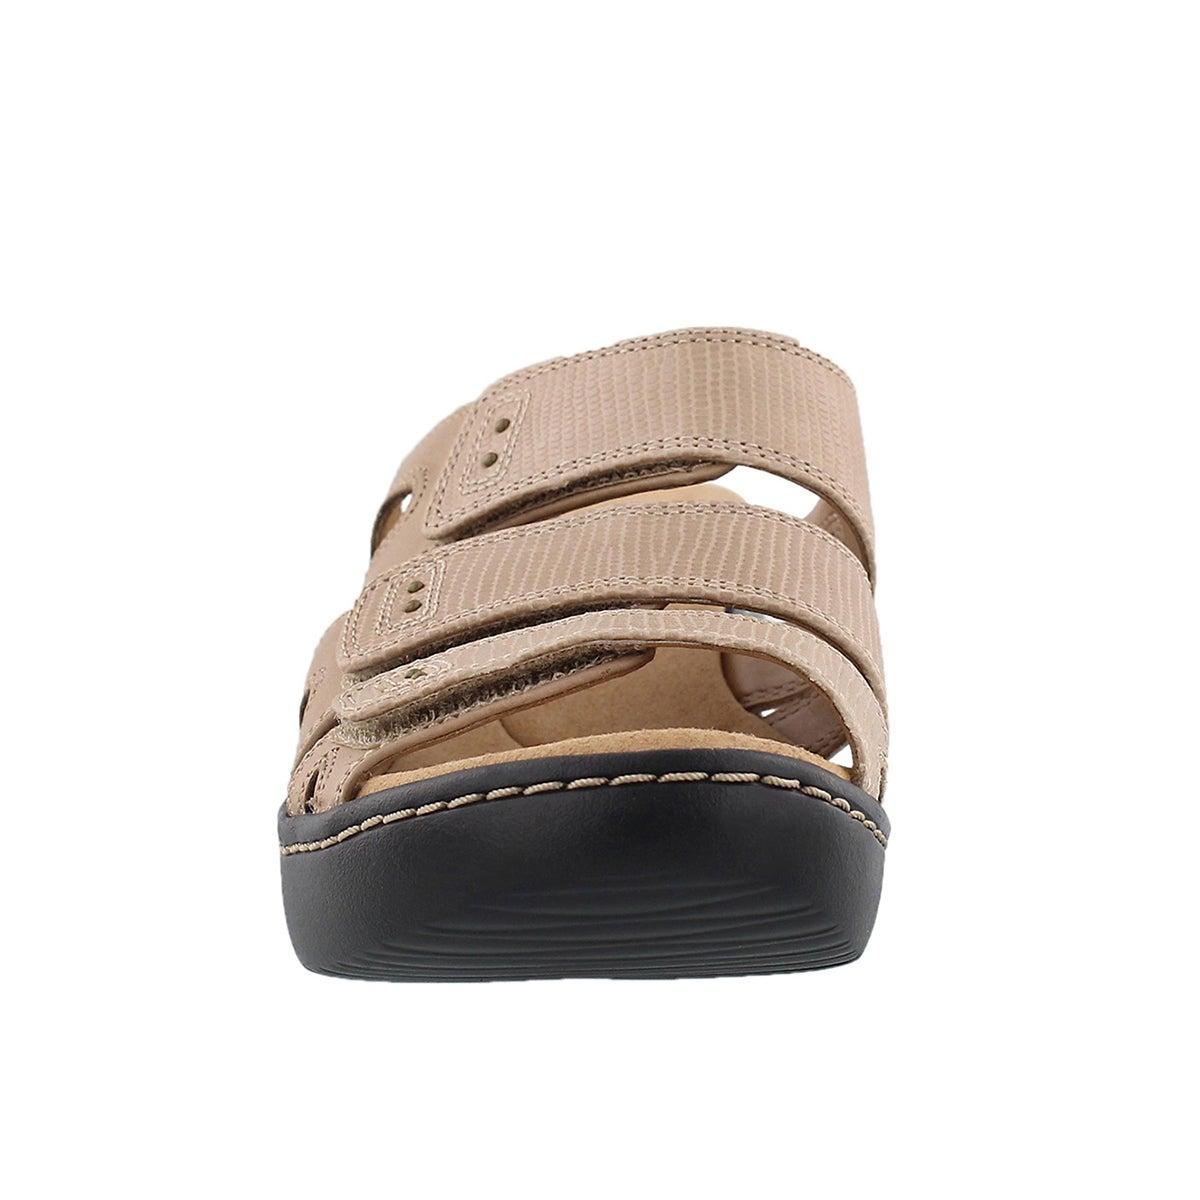 Lds Delana Damir snd casual slide sandal